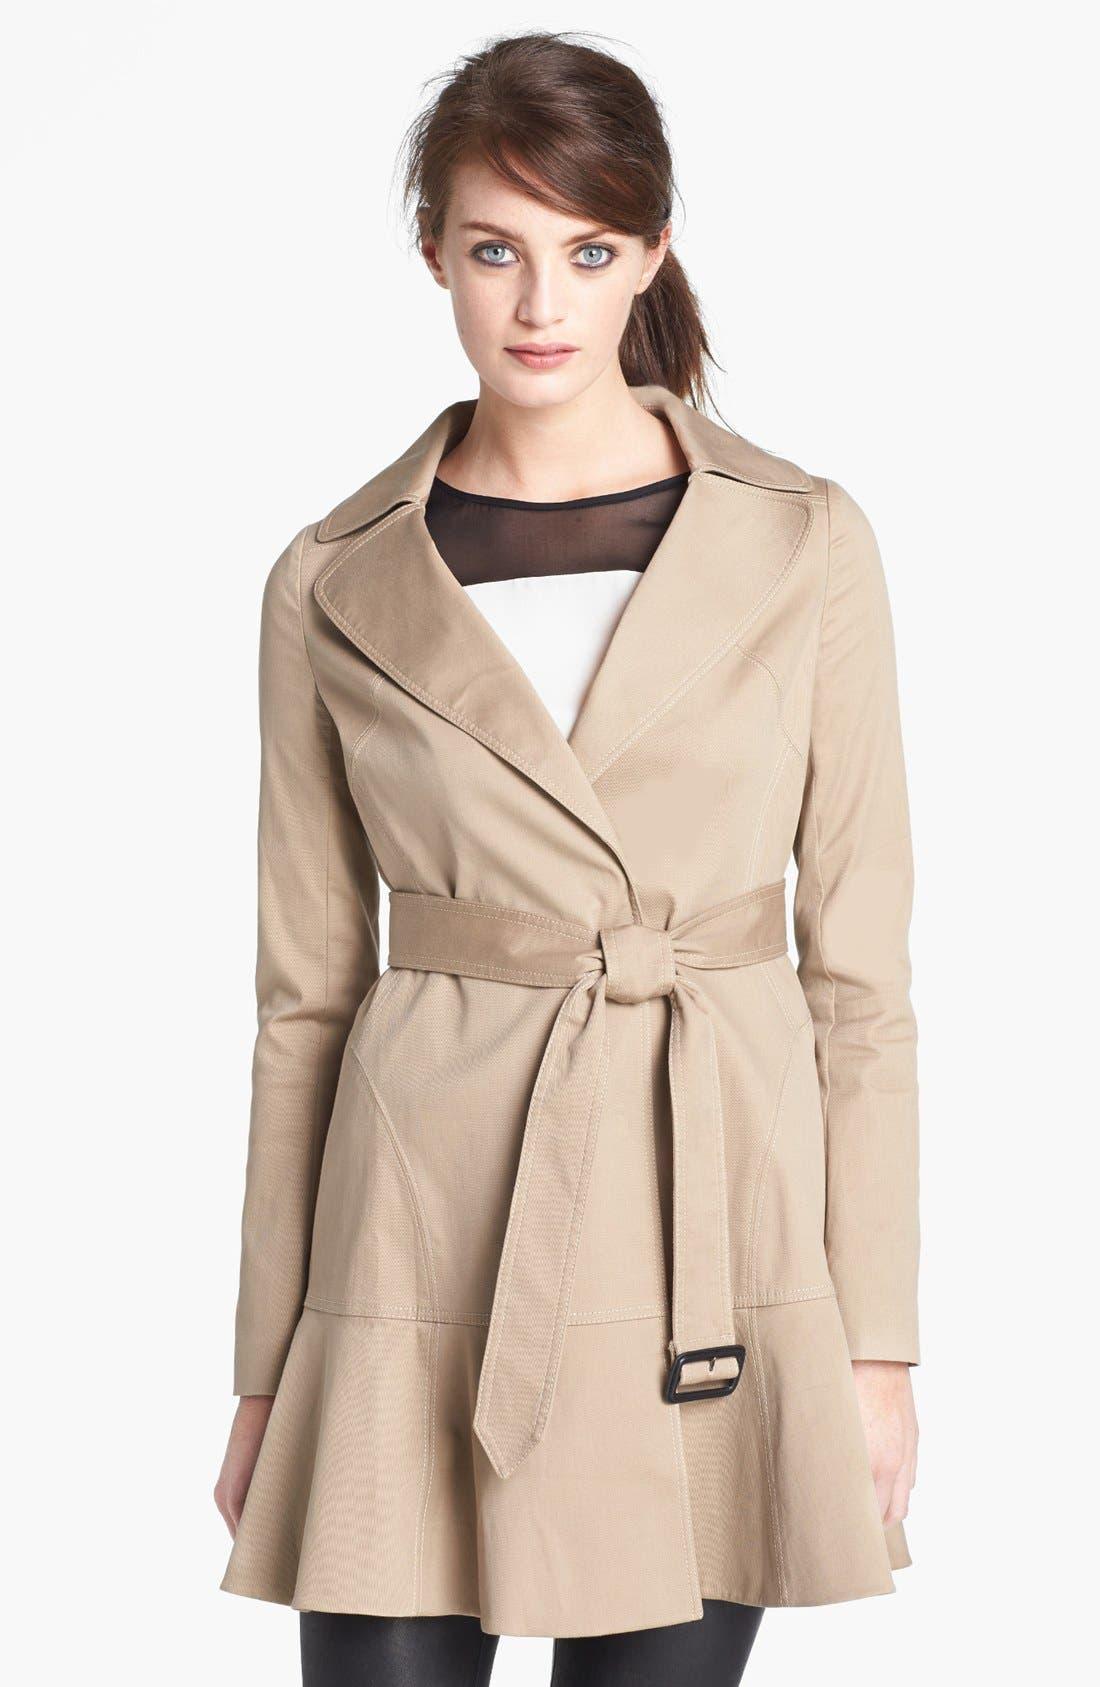 Alternate Image 1 Selected - Diane von Furstenberg 'Kadence' Cotton Blend Trench Coat